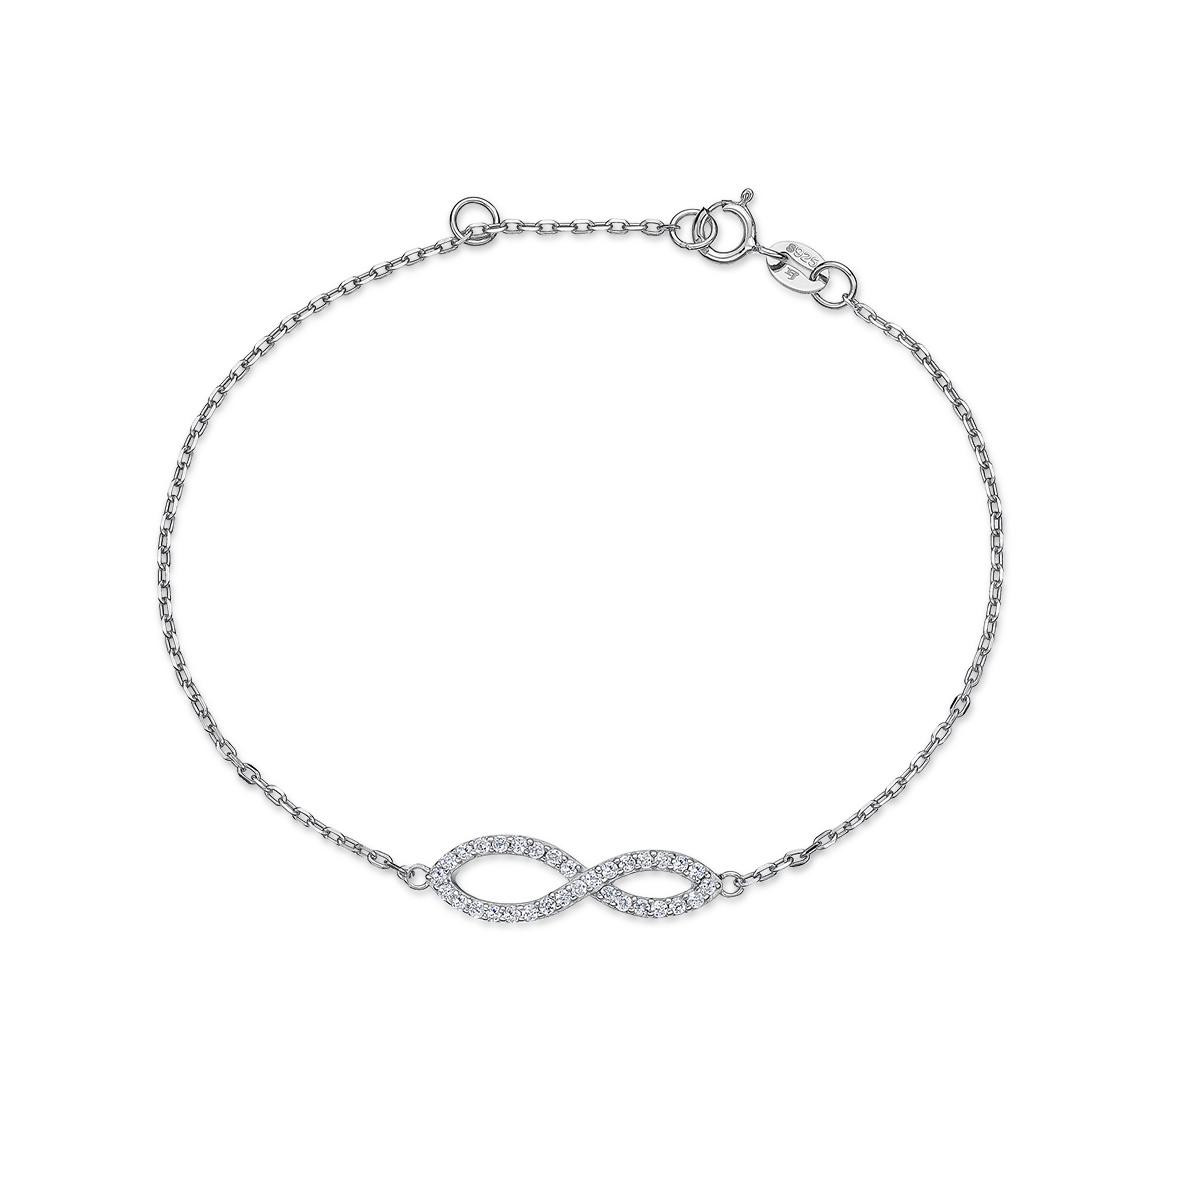 CS50 璀璨軌跡-八字形無限奢華手鍊